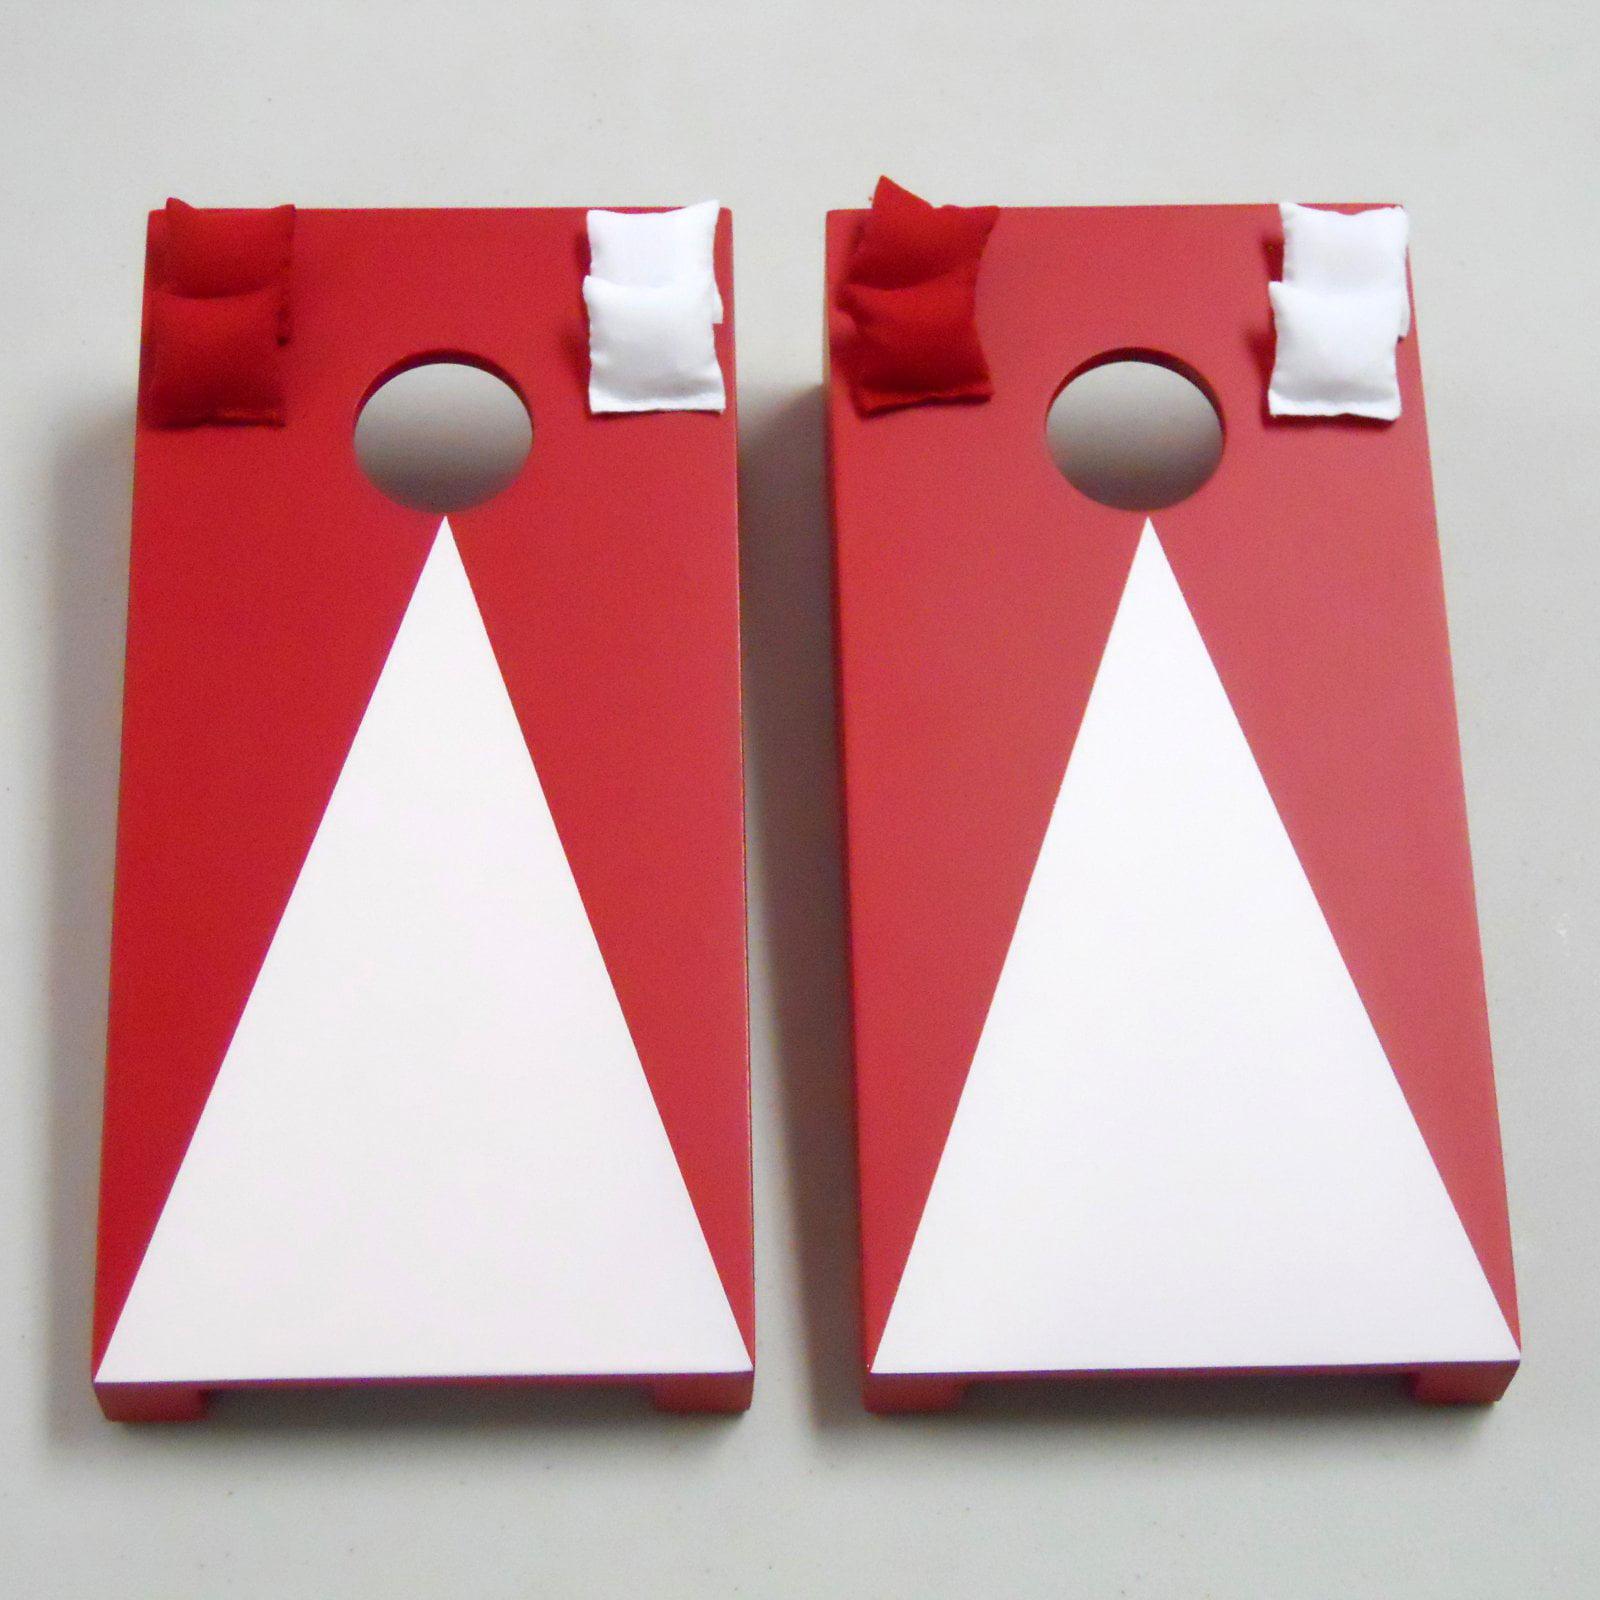 Red Pyramid Tabletop Cornhole Set by AJJ Cornhole